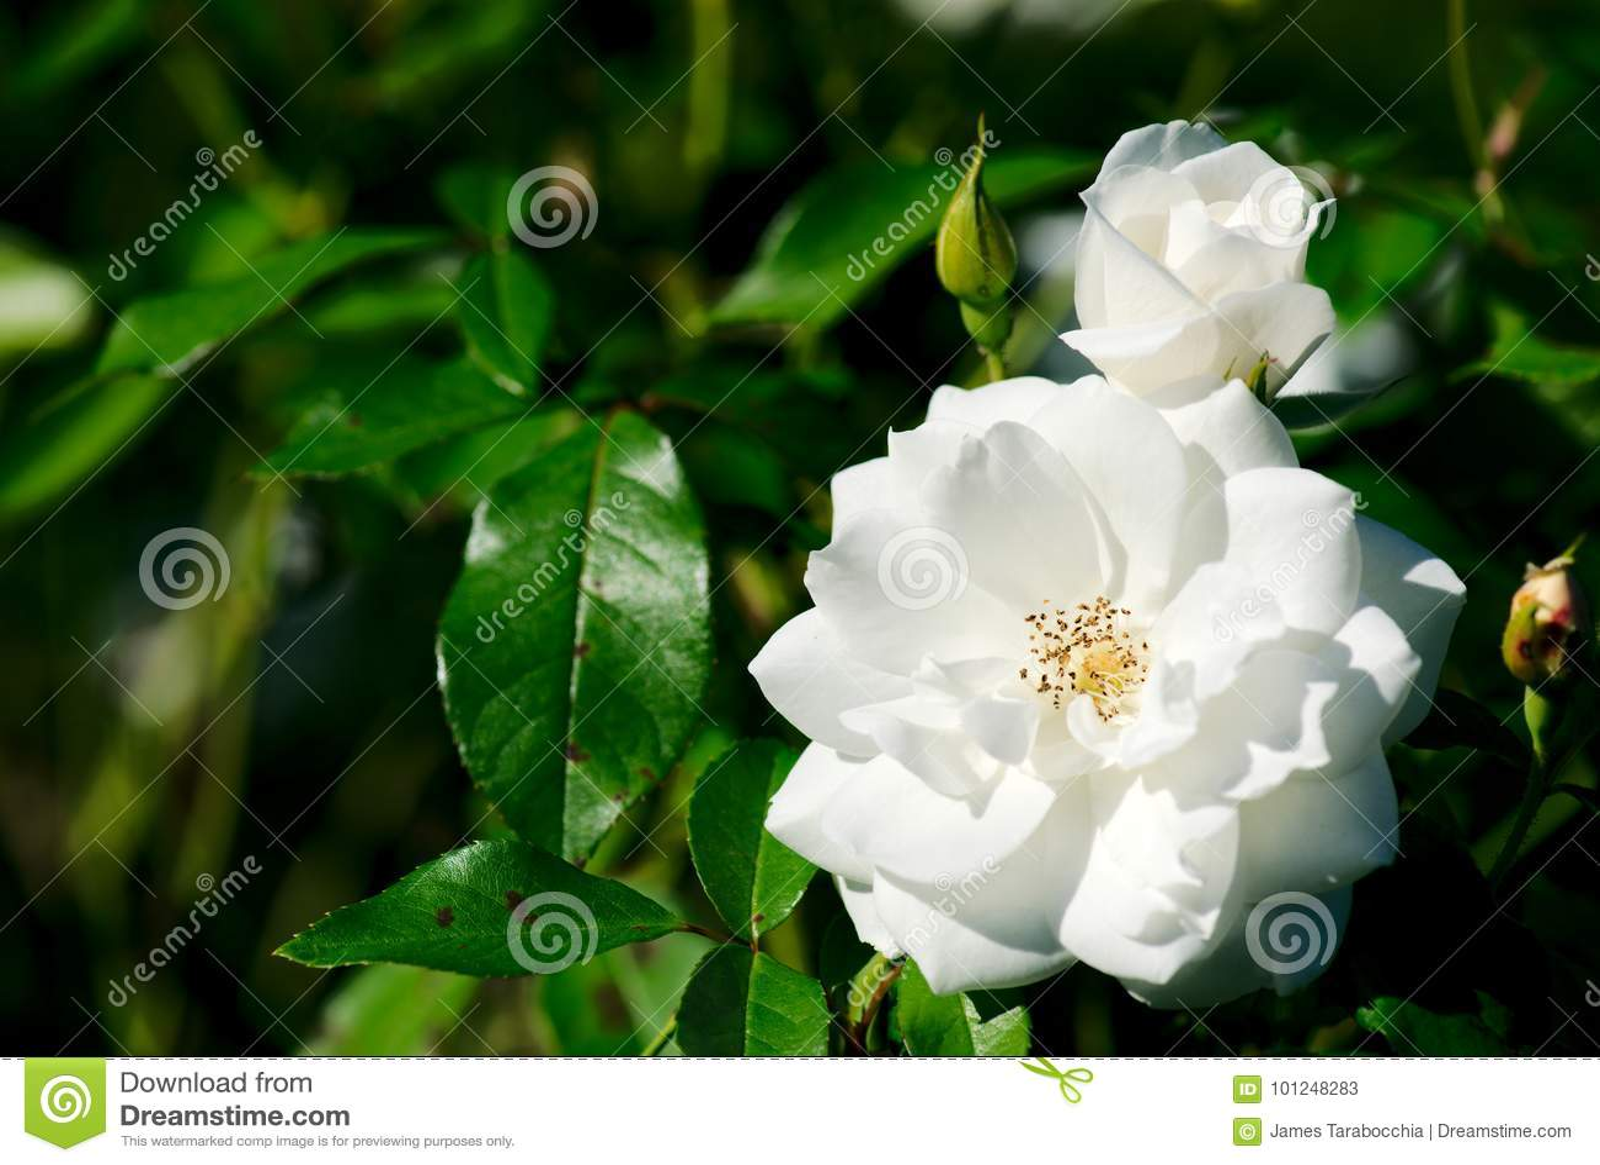 Iceberg Floribunda Rose Rosa Korbin flower plant bloom